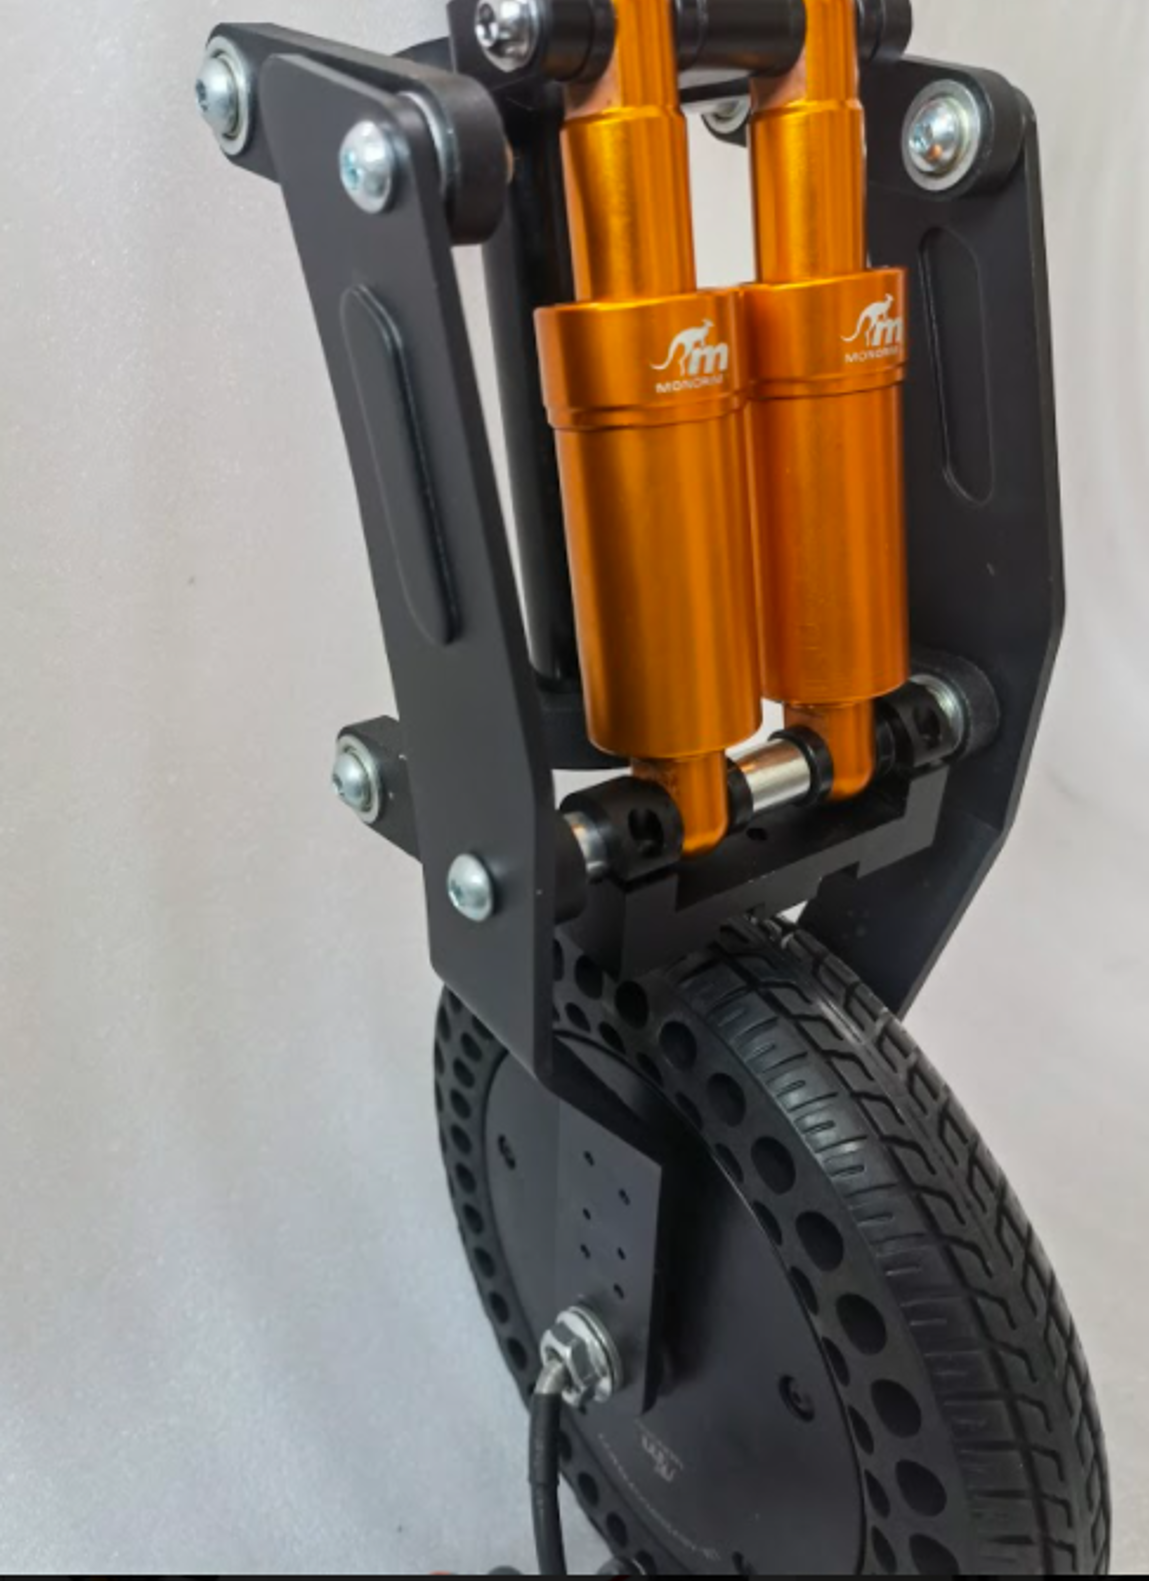 Monorim Dual Front Suspension Kit For Segway MAX G30